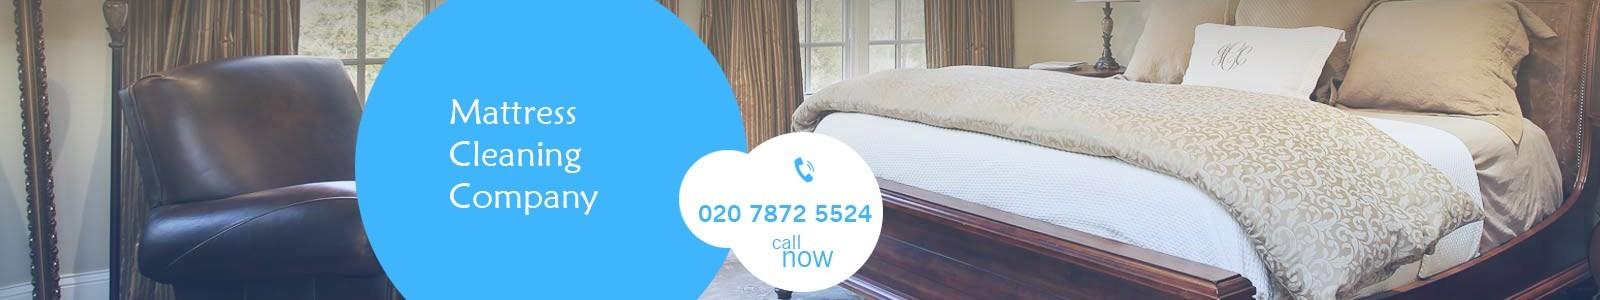 mattress-cleaning-company